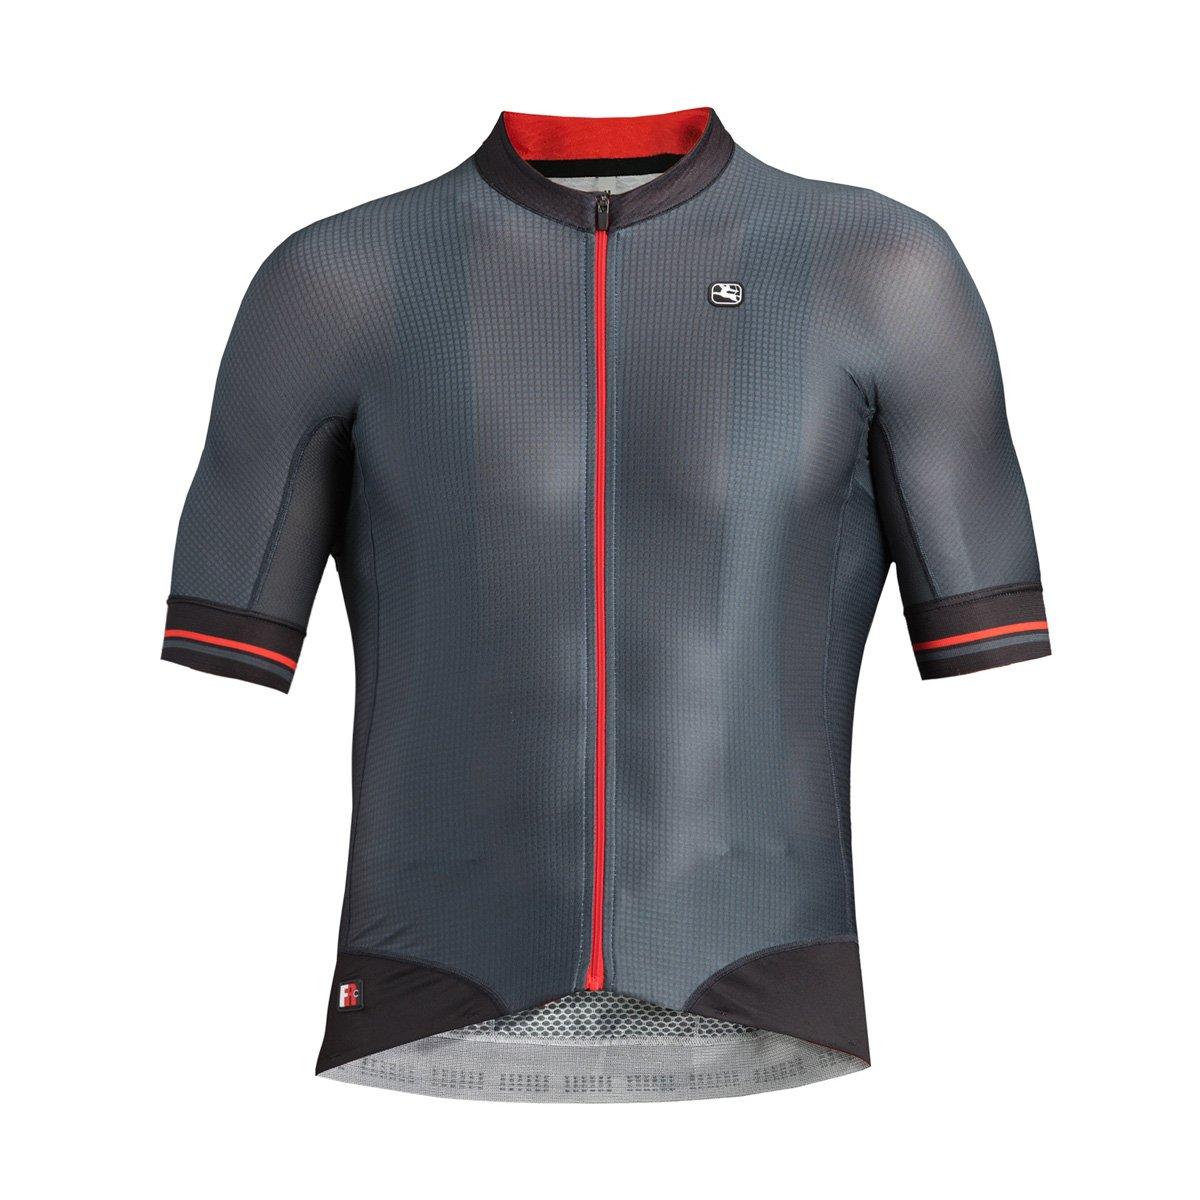 Giordana fr-c Pro半袖Jersey – Men 's B077GX1WHQ XL|グレー/ブラック グレー/ブラック XL